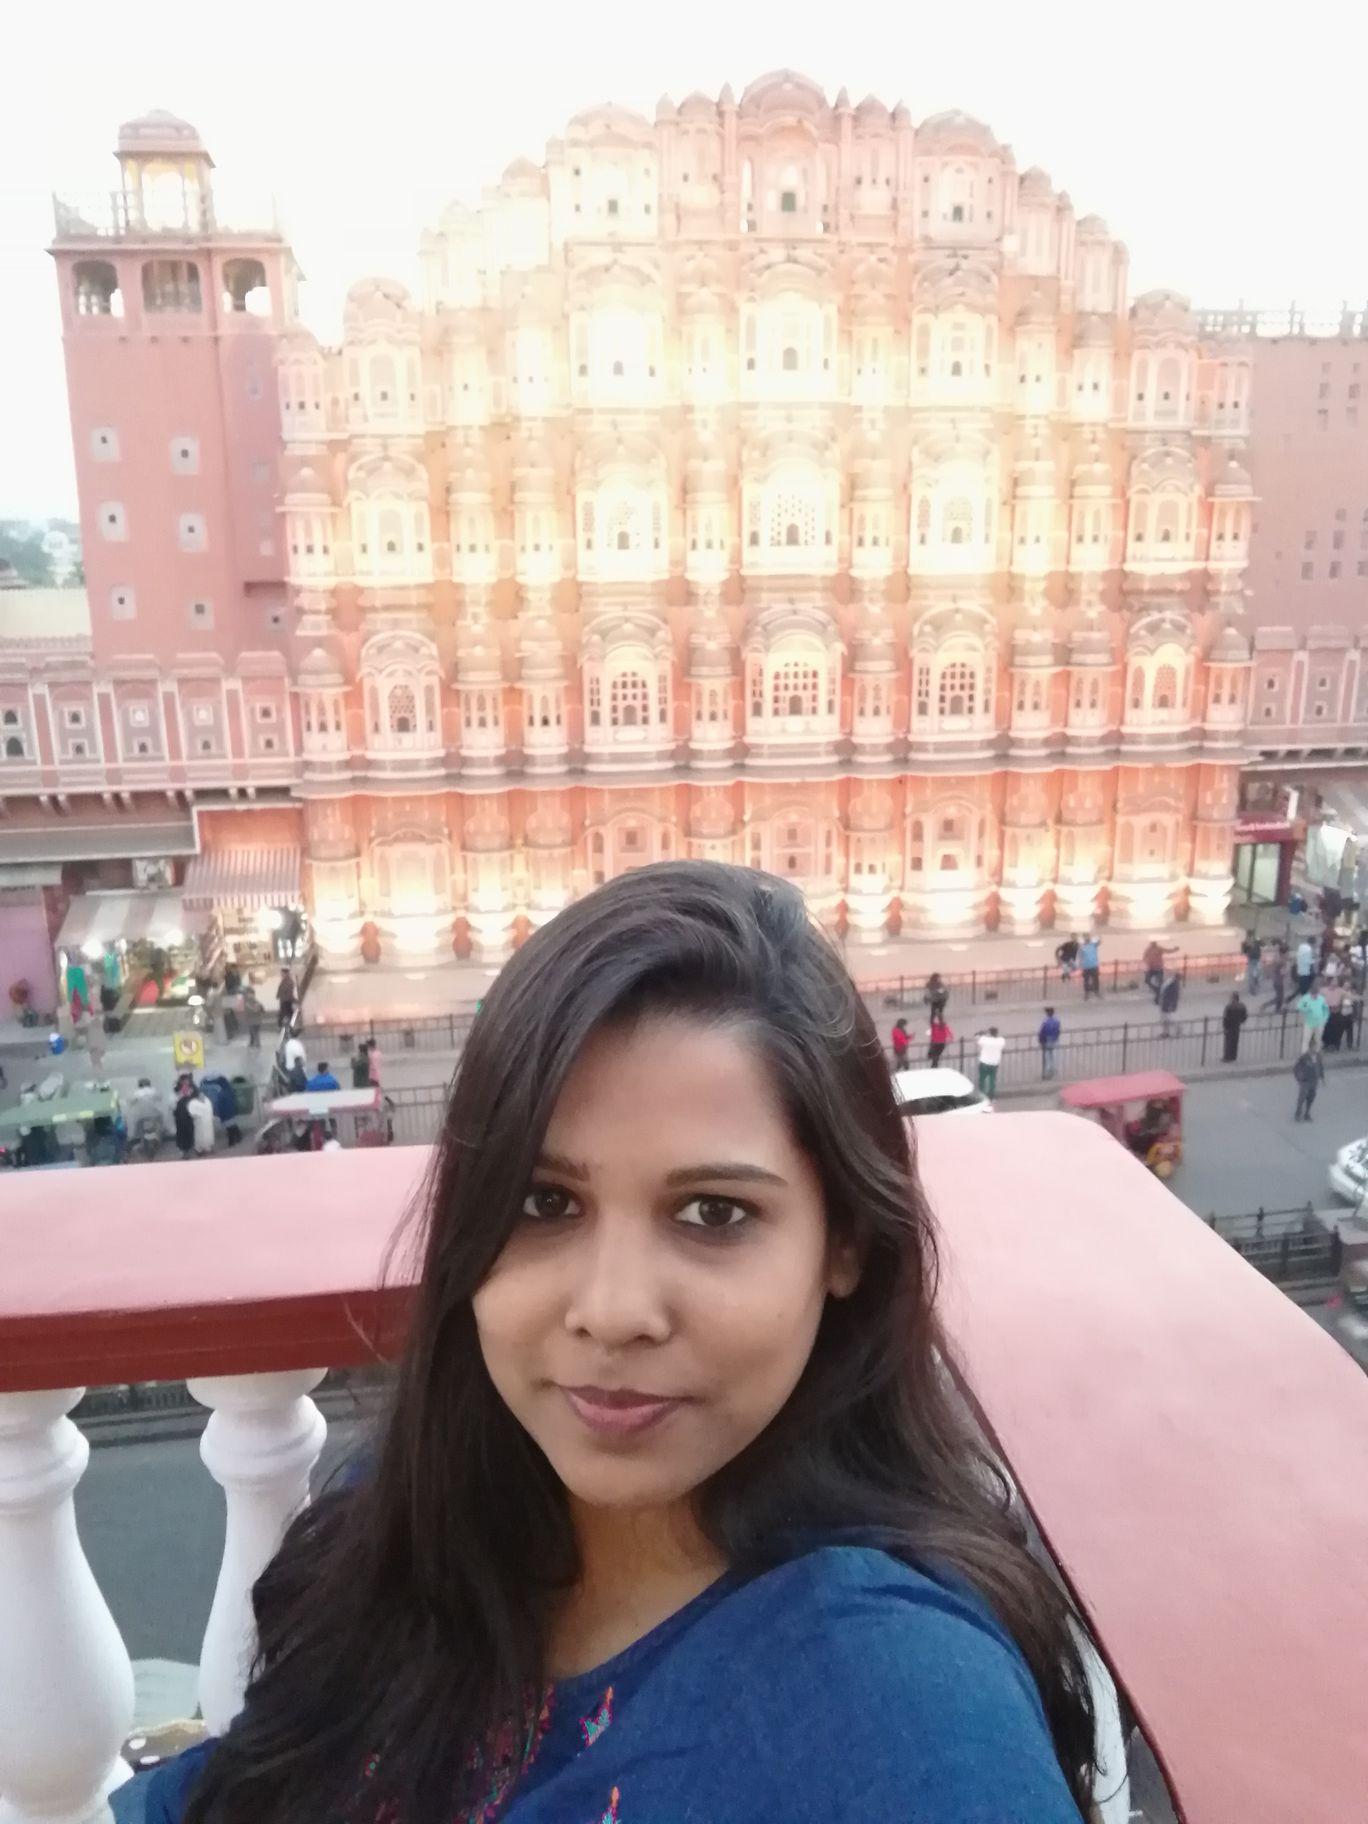 Photo of Jaipur By Bhavya Tiramdasu